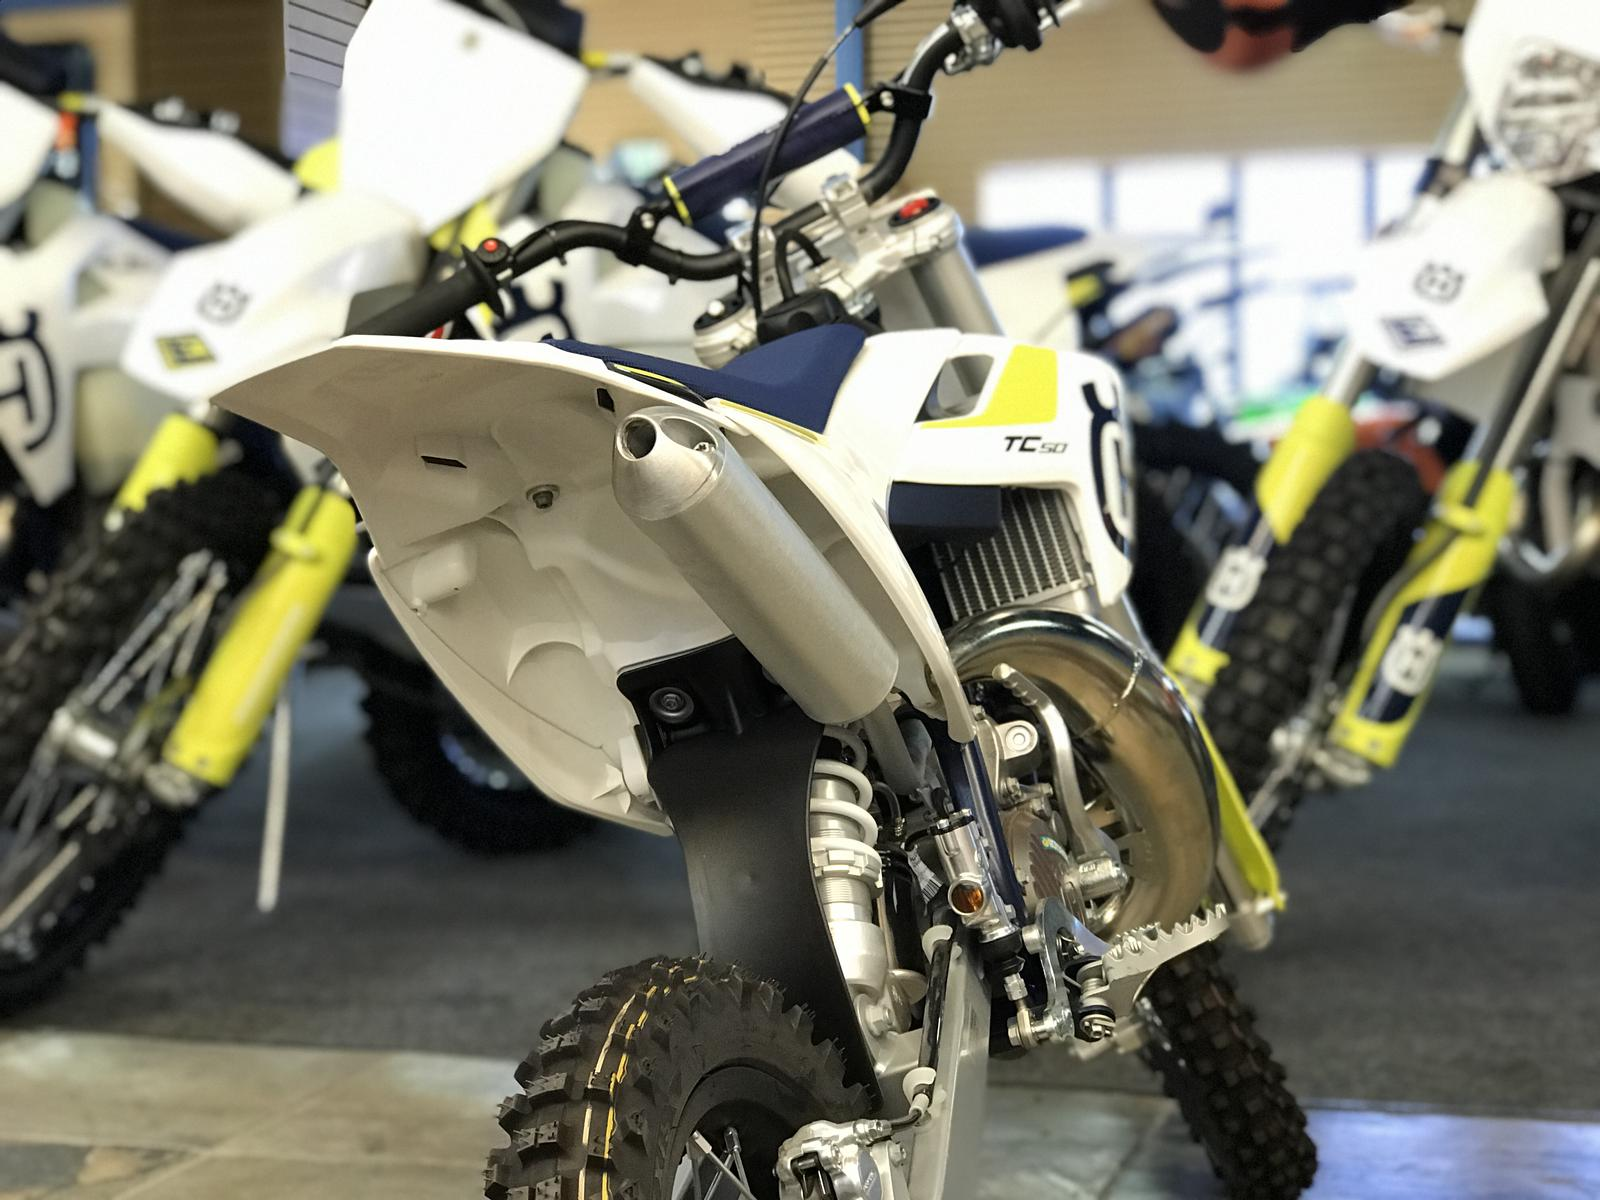 2019 Husqvarna Motorcycles TC 50